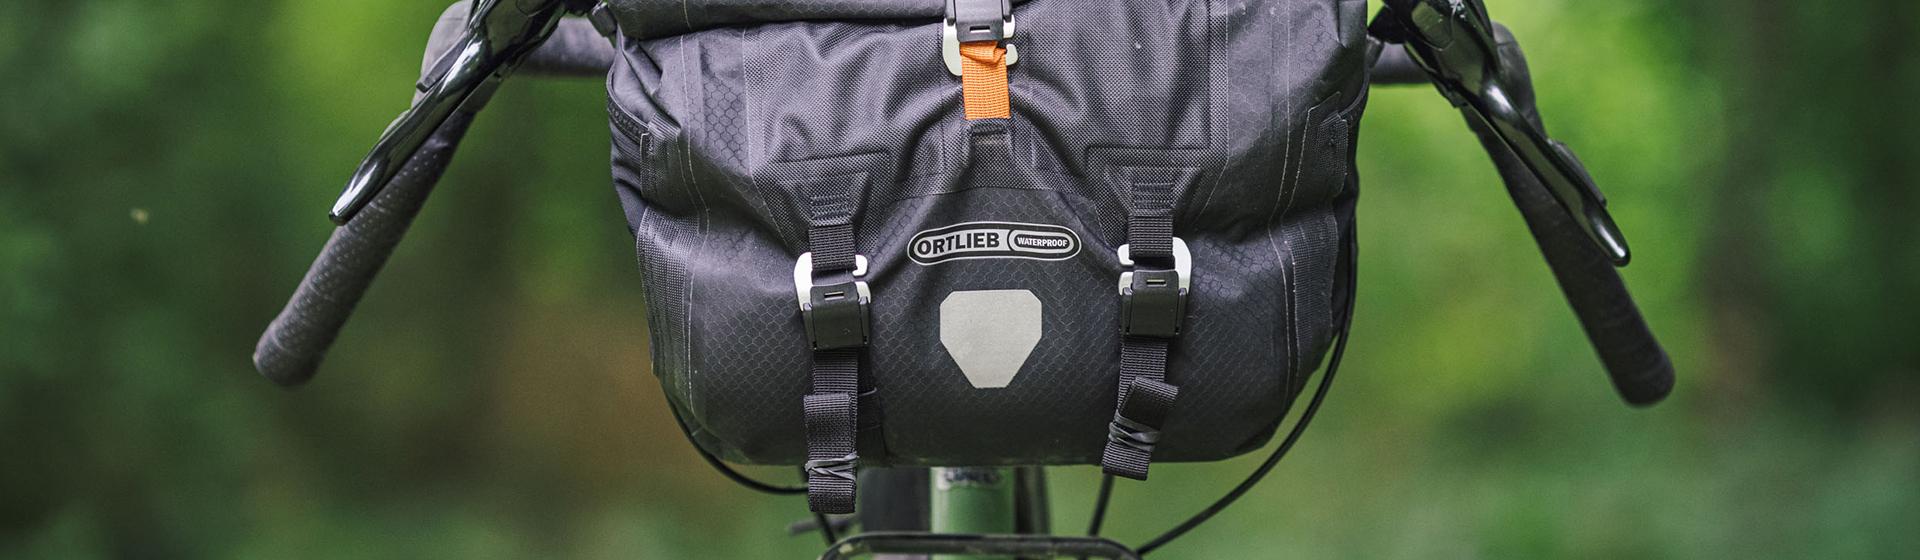 Ortlieb Bags